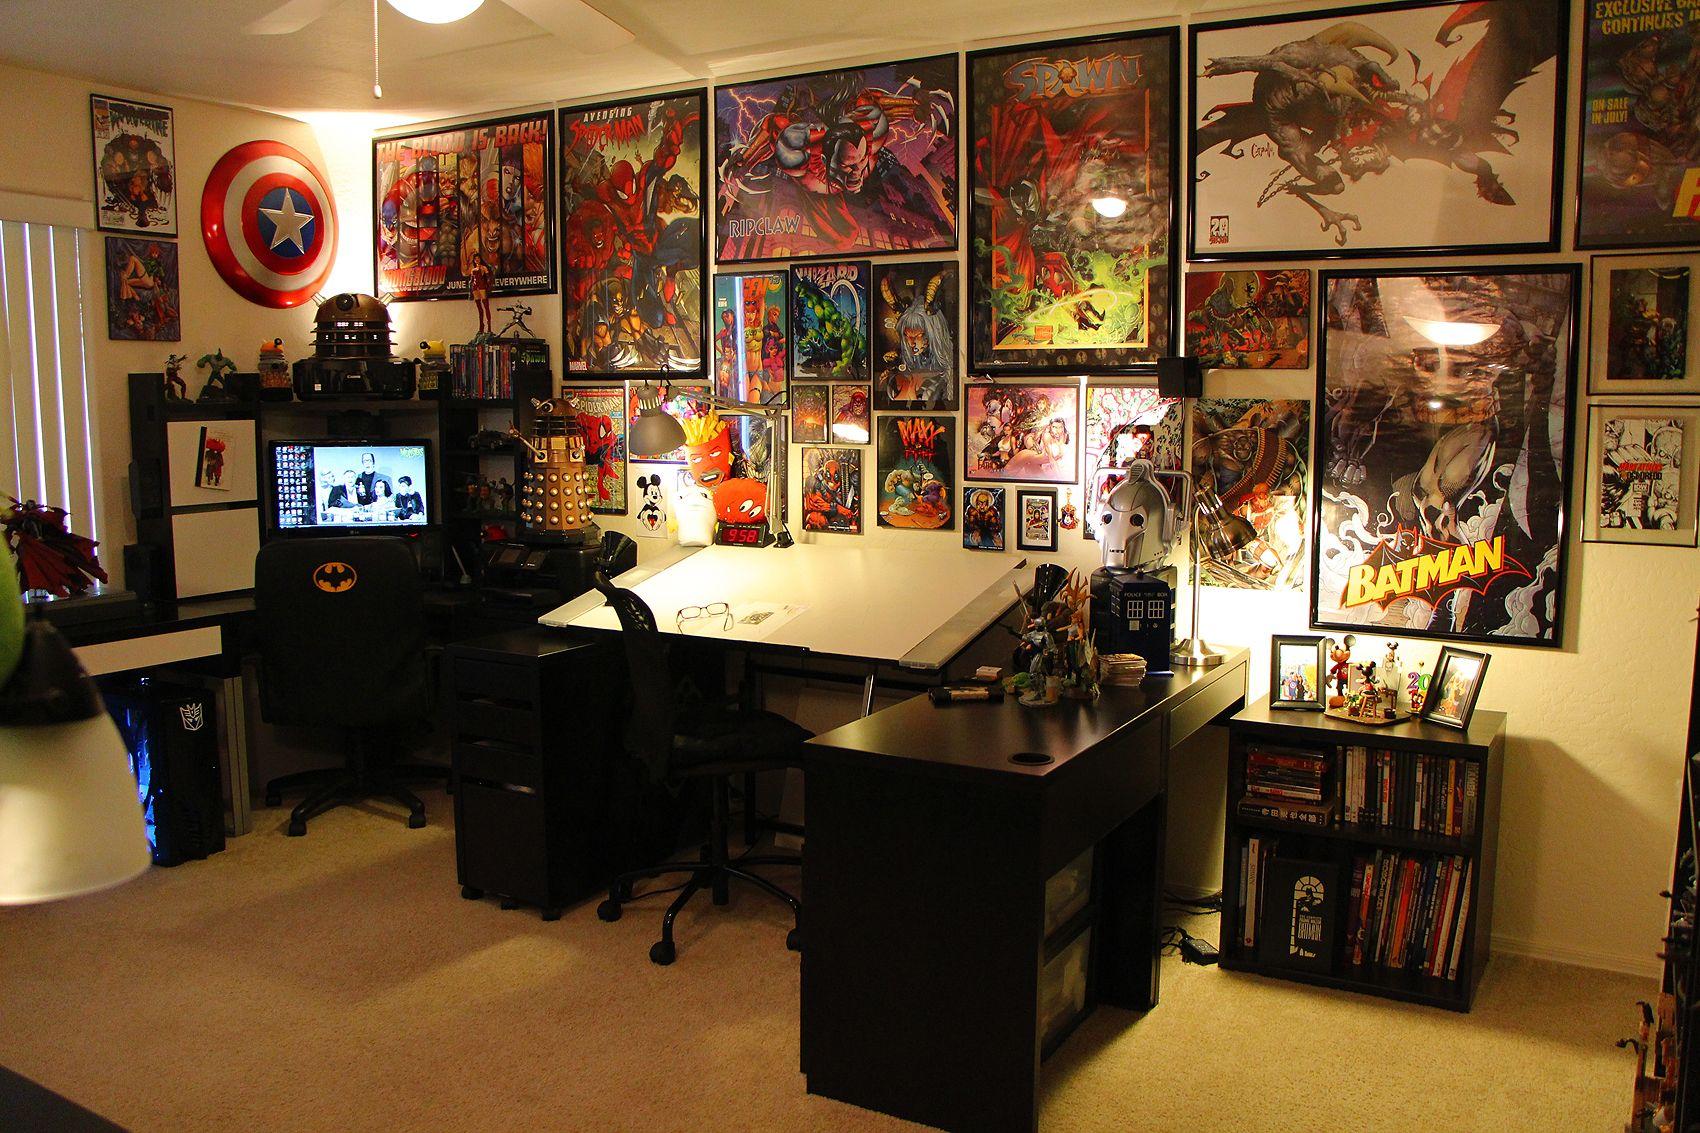 Where I would like to work.